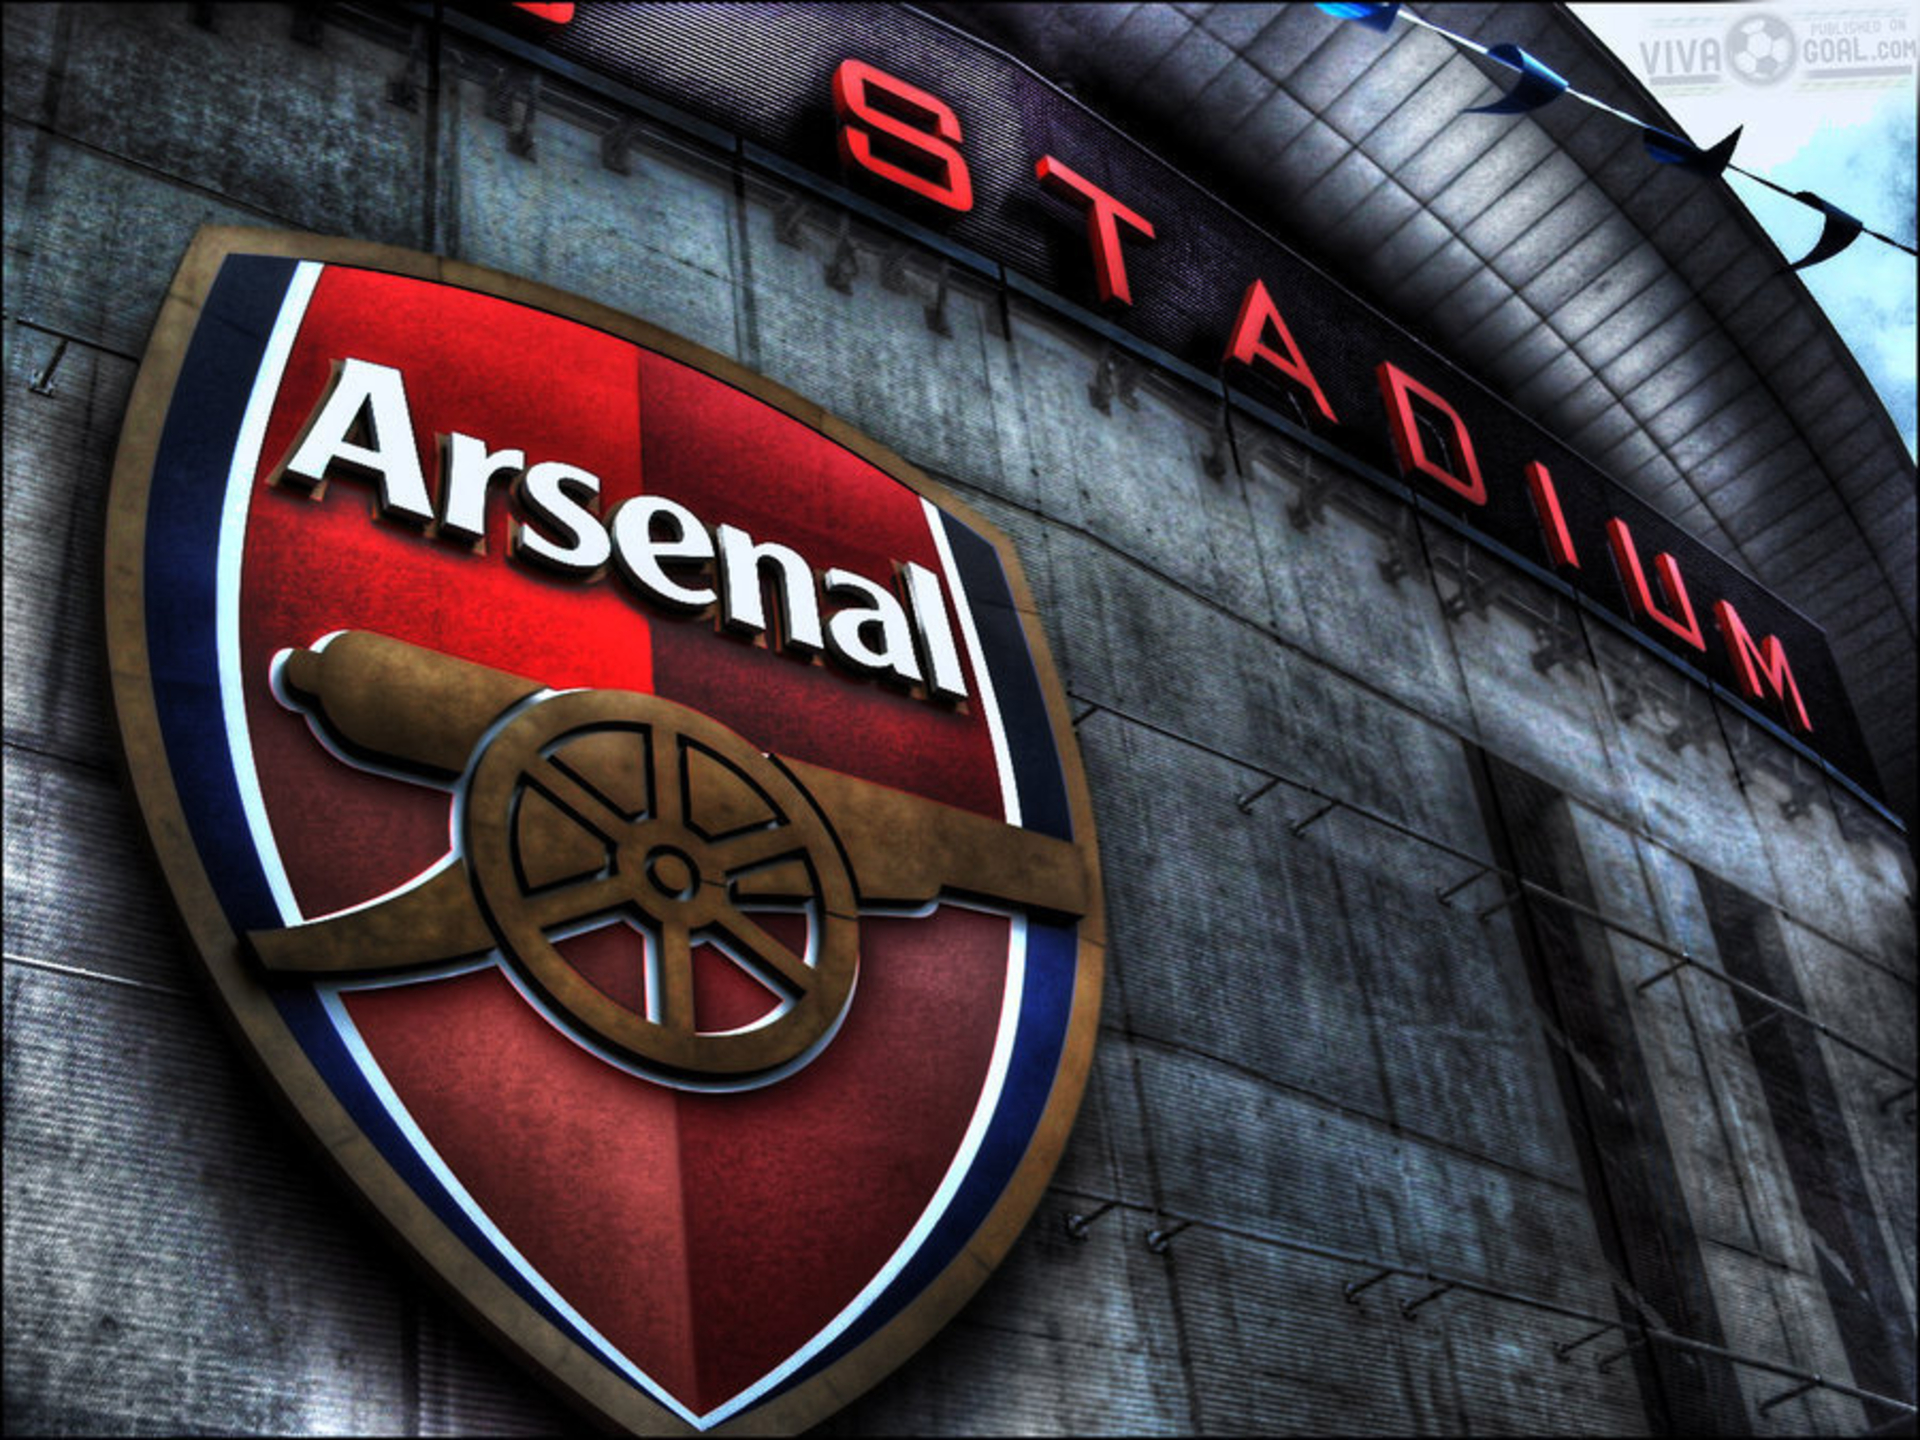 Arsenal FC Stadium - Arsenal FC Stadium